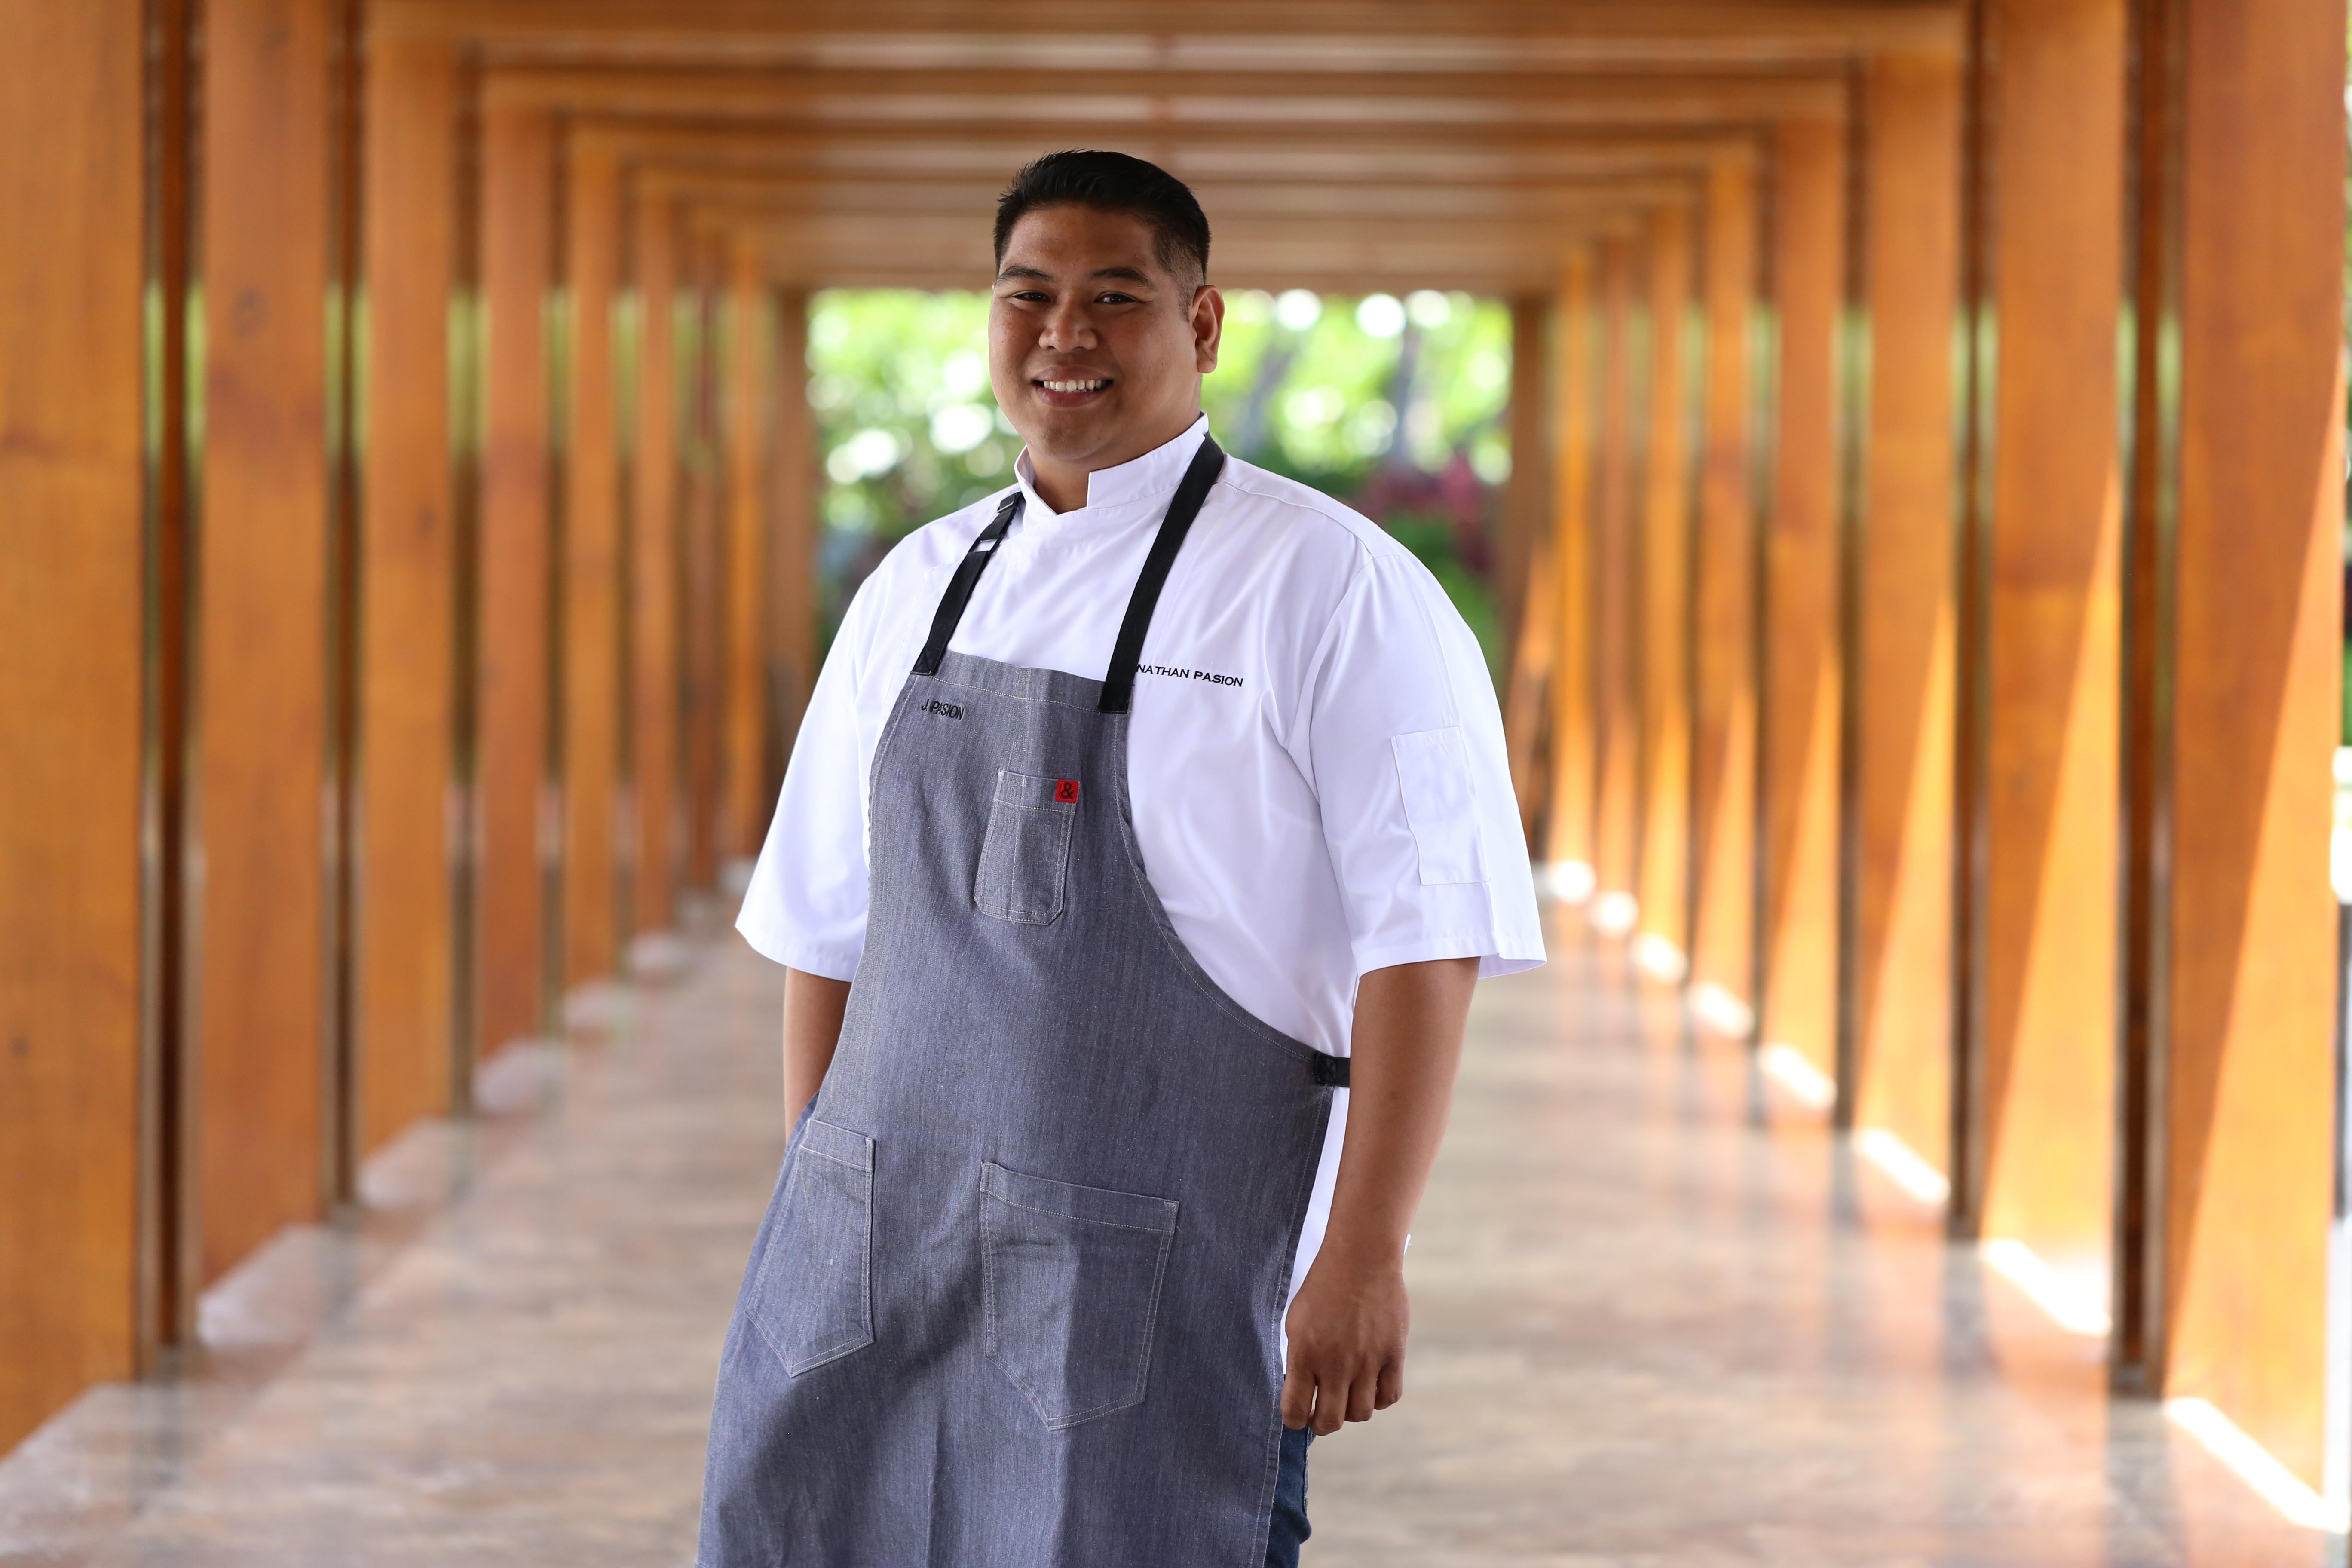 Andaz Chef Wins Hyatt Regional Culinary Challenge